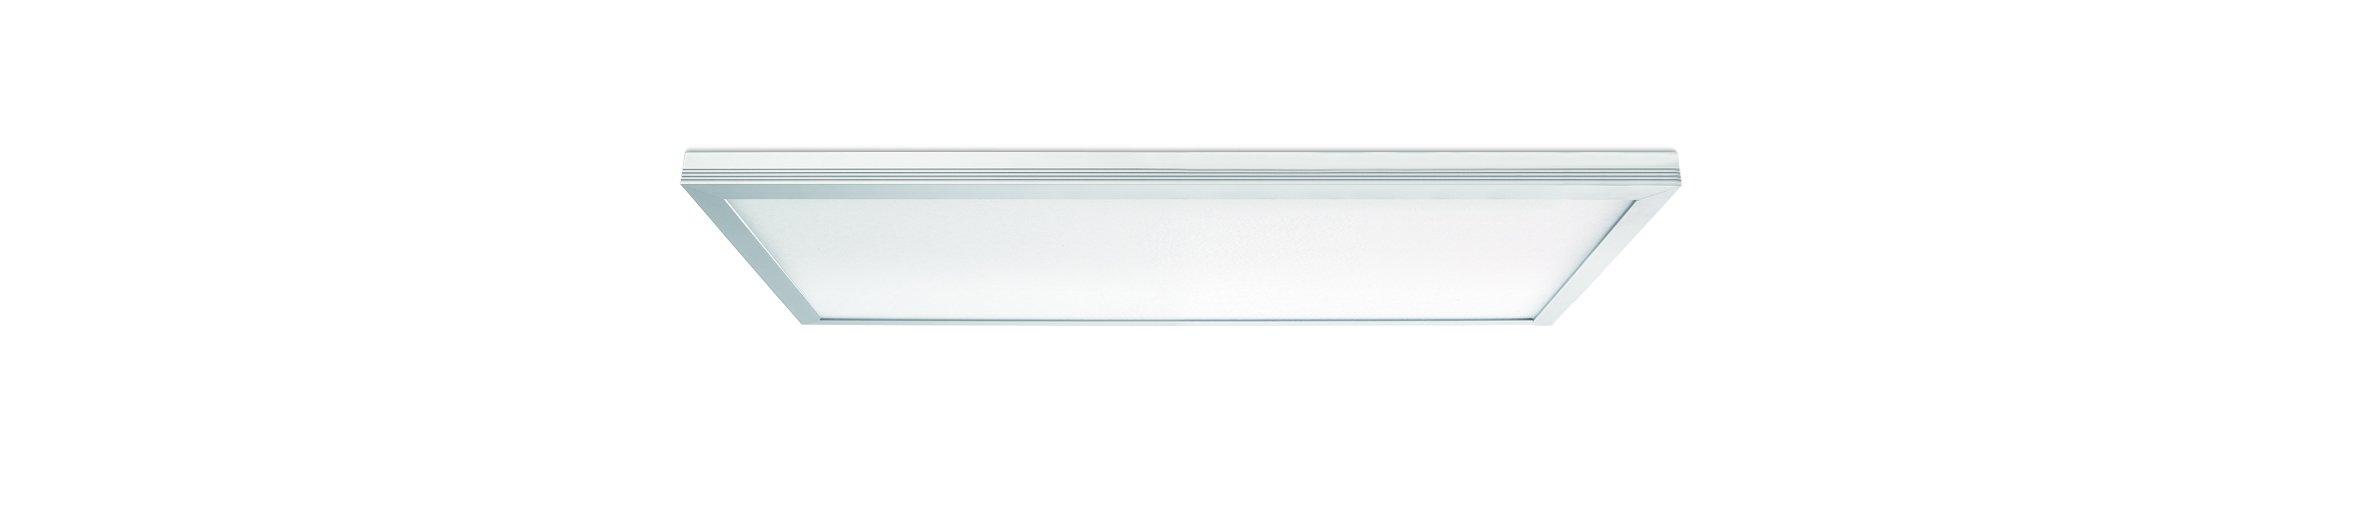 Leviton SKT12-CW Skytile 20-Watt Brushed Aluminum 1 x 2 Integrated LED Flat Panel Light, Cool White Temperature